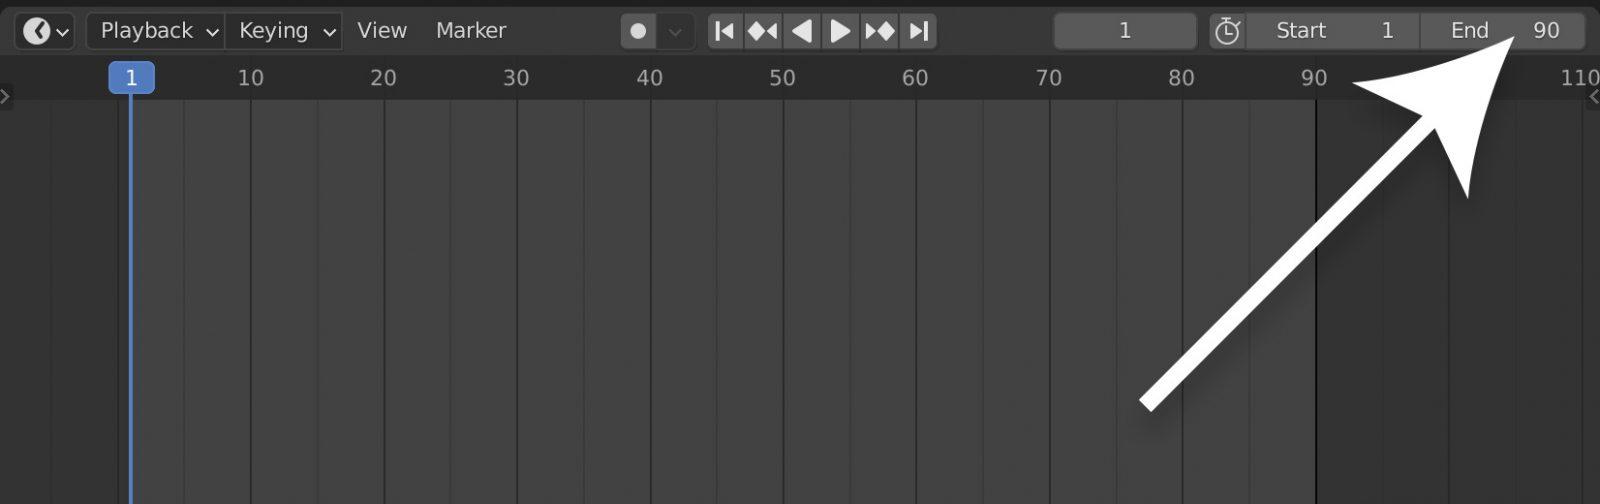 Setting the timeline duration in Blender